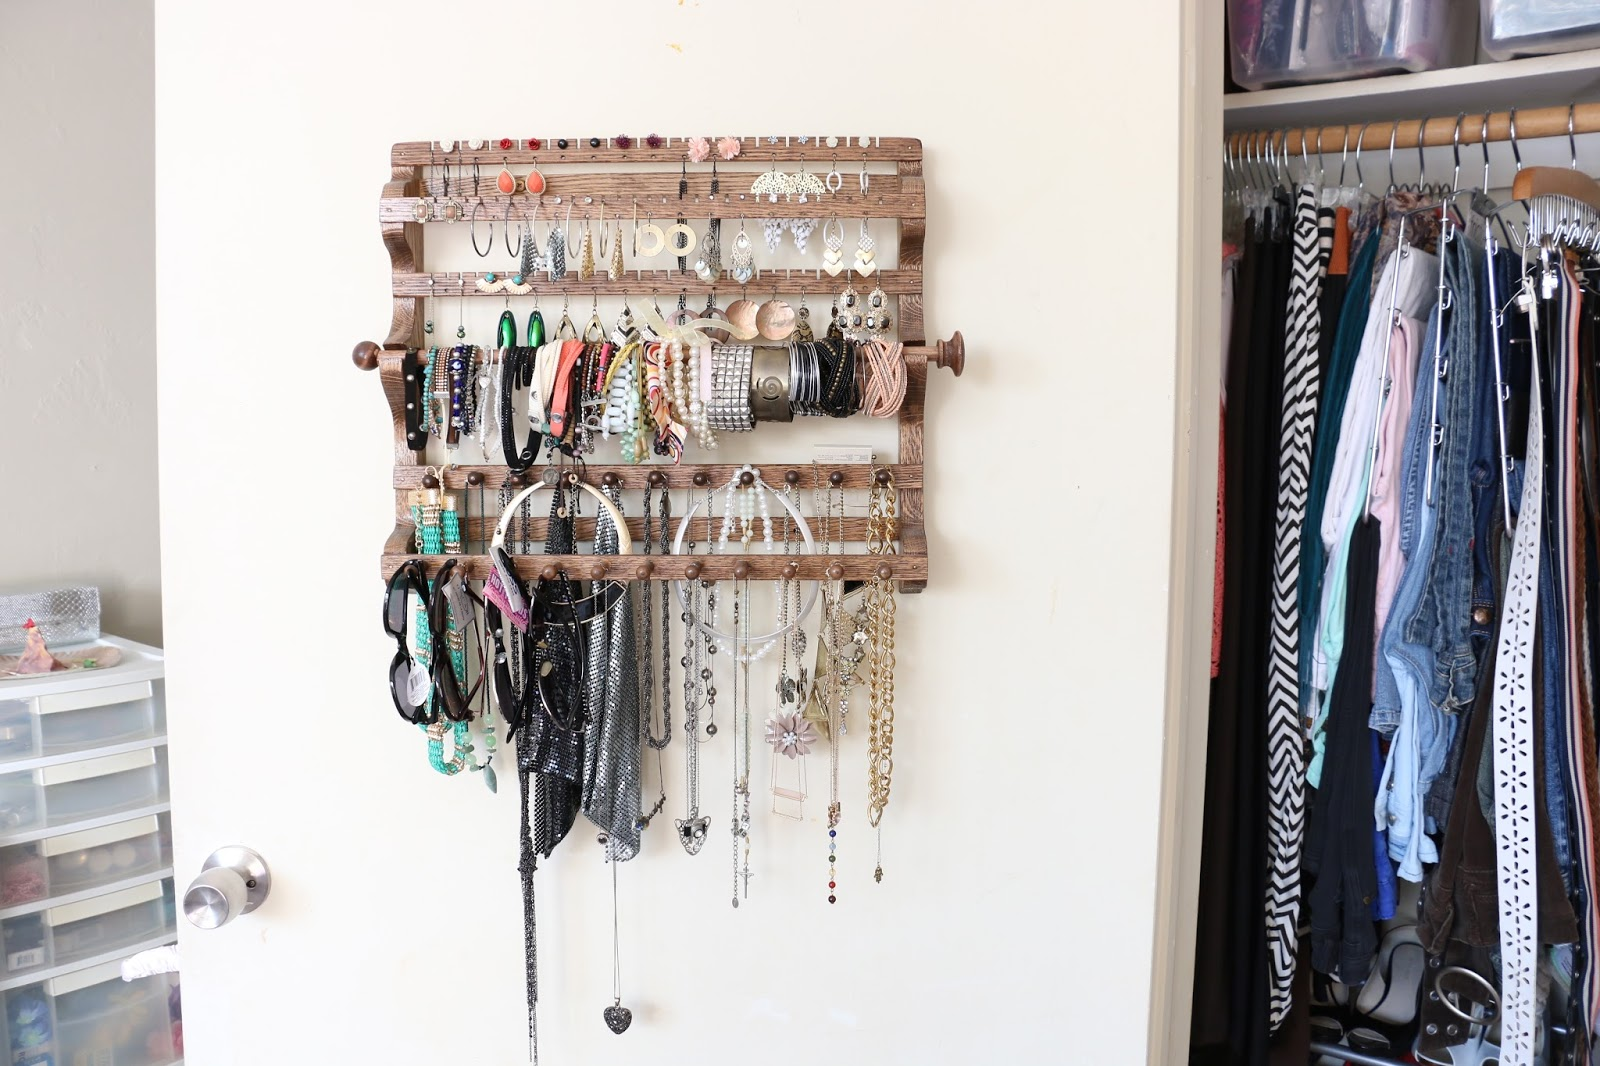 dise con ahorra closet kb encantador espacio dormitorio tv ropa para de organizador o